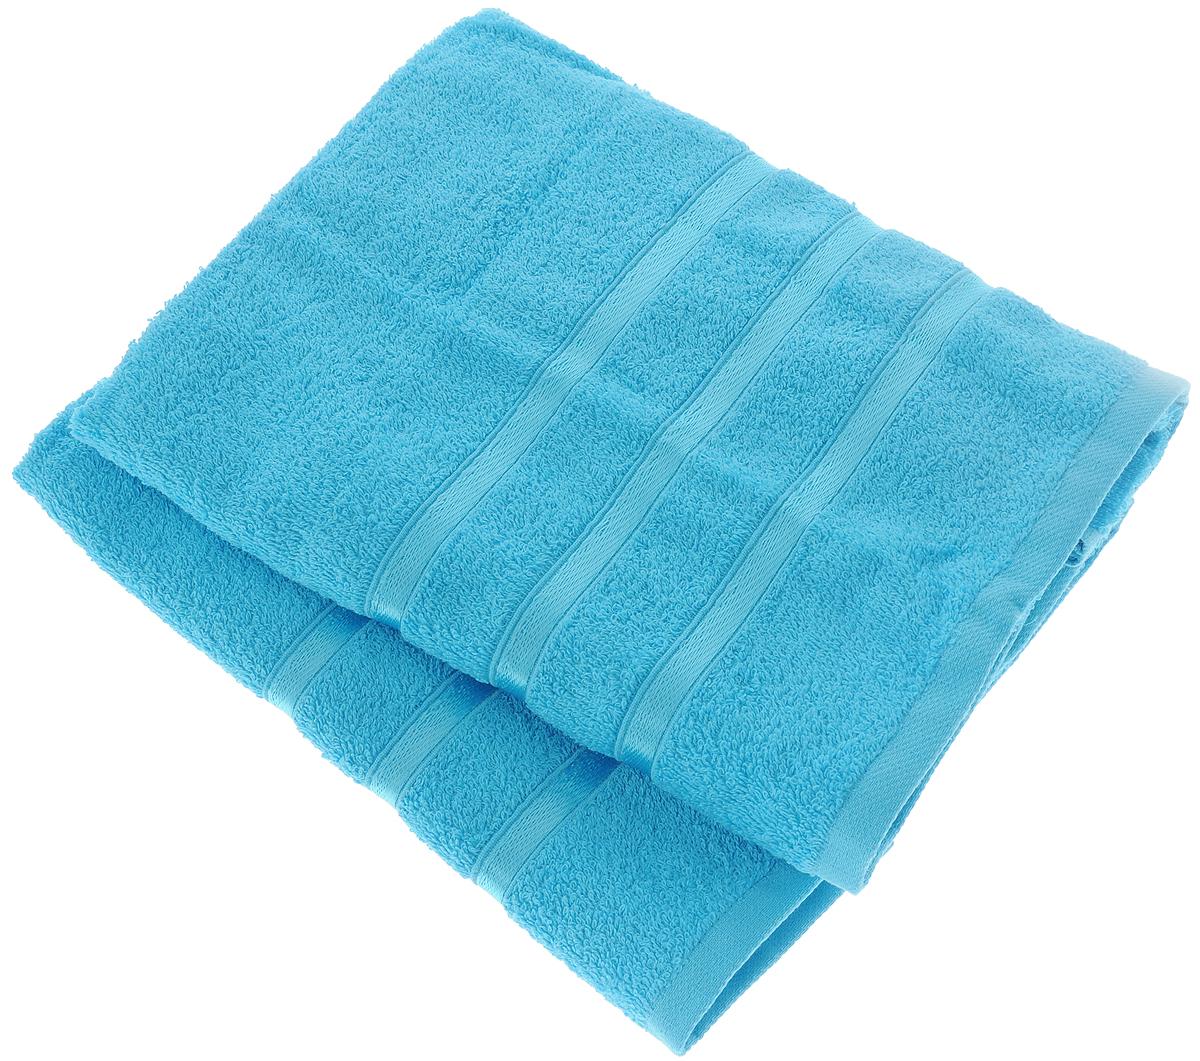 Набор полотенец Tete-a-Tete Ленты, цвет: бирюзовый, 50 х 85 см, 2 шт набор полотенец tete a tete сердечки цвет желтый бирюза 50 х 90 см 2 шт